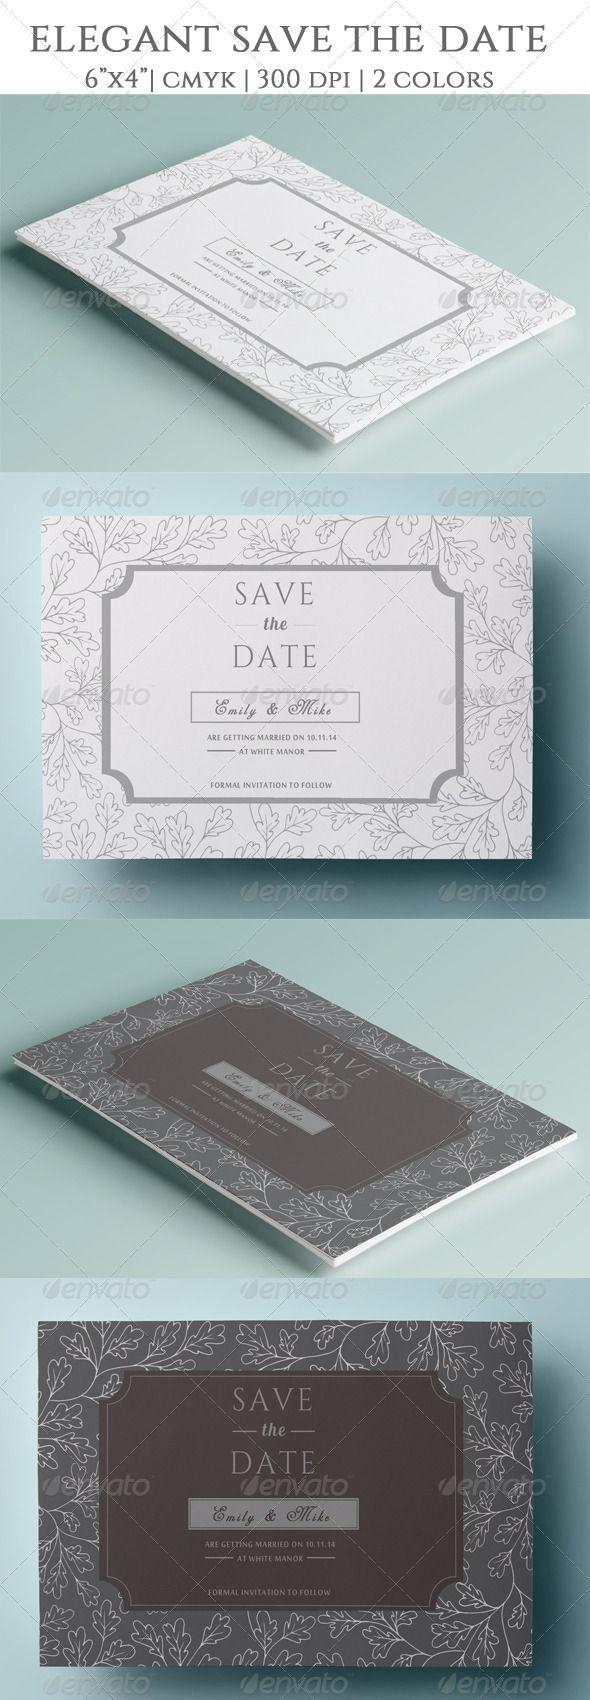 wedding invitation template themeforest%0A Elegant Save the Date  Invitation TemplatesPrint